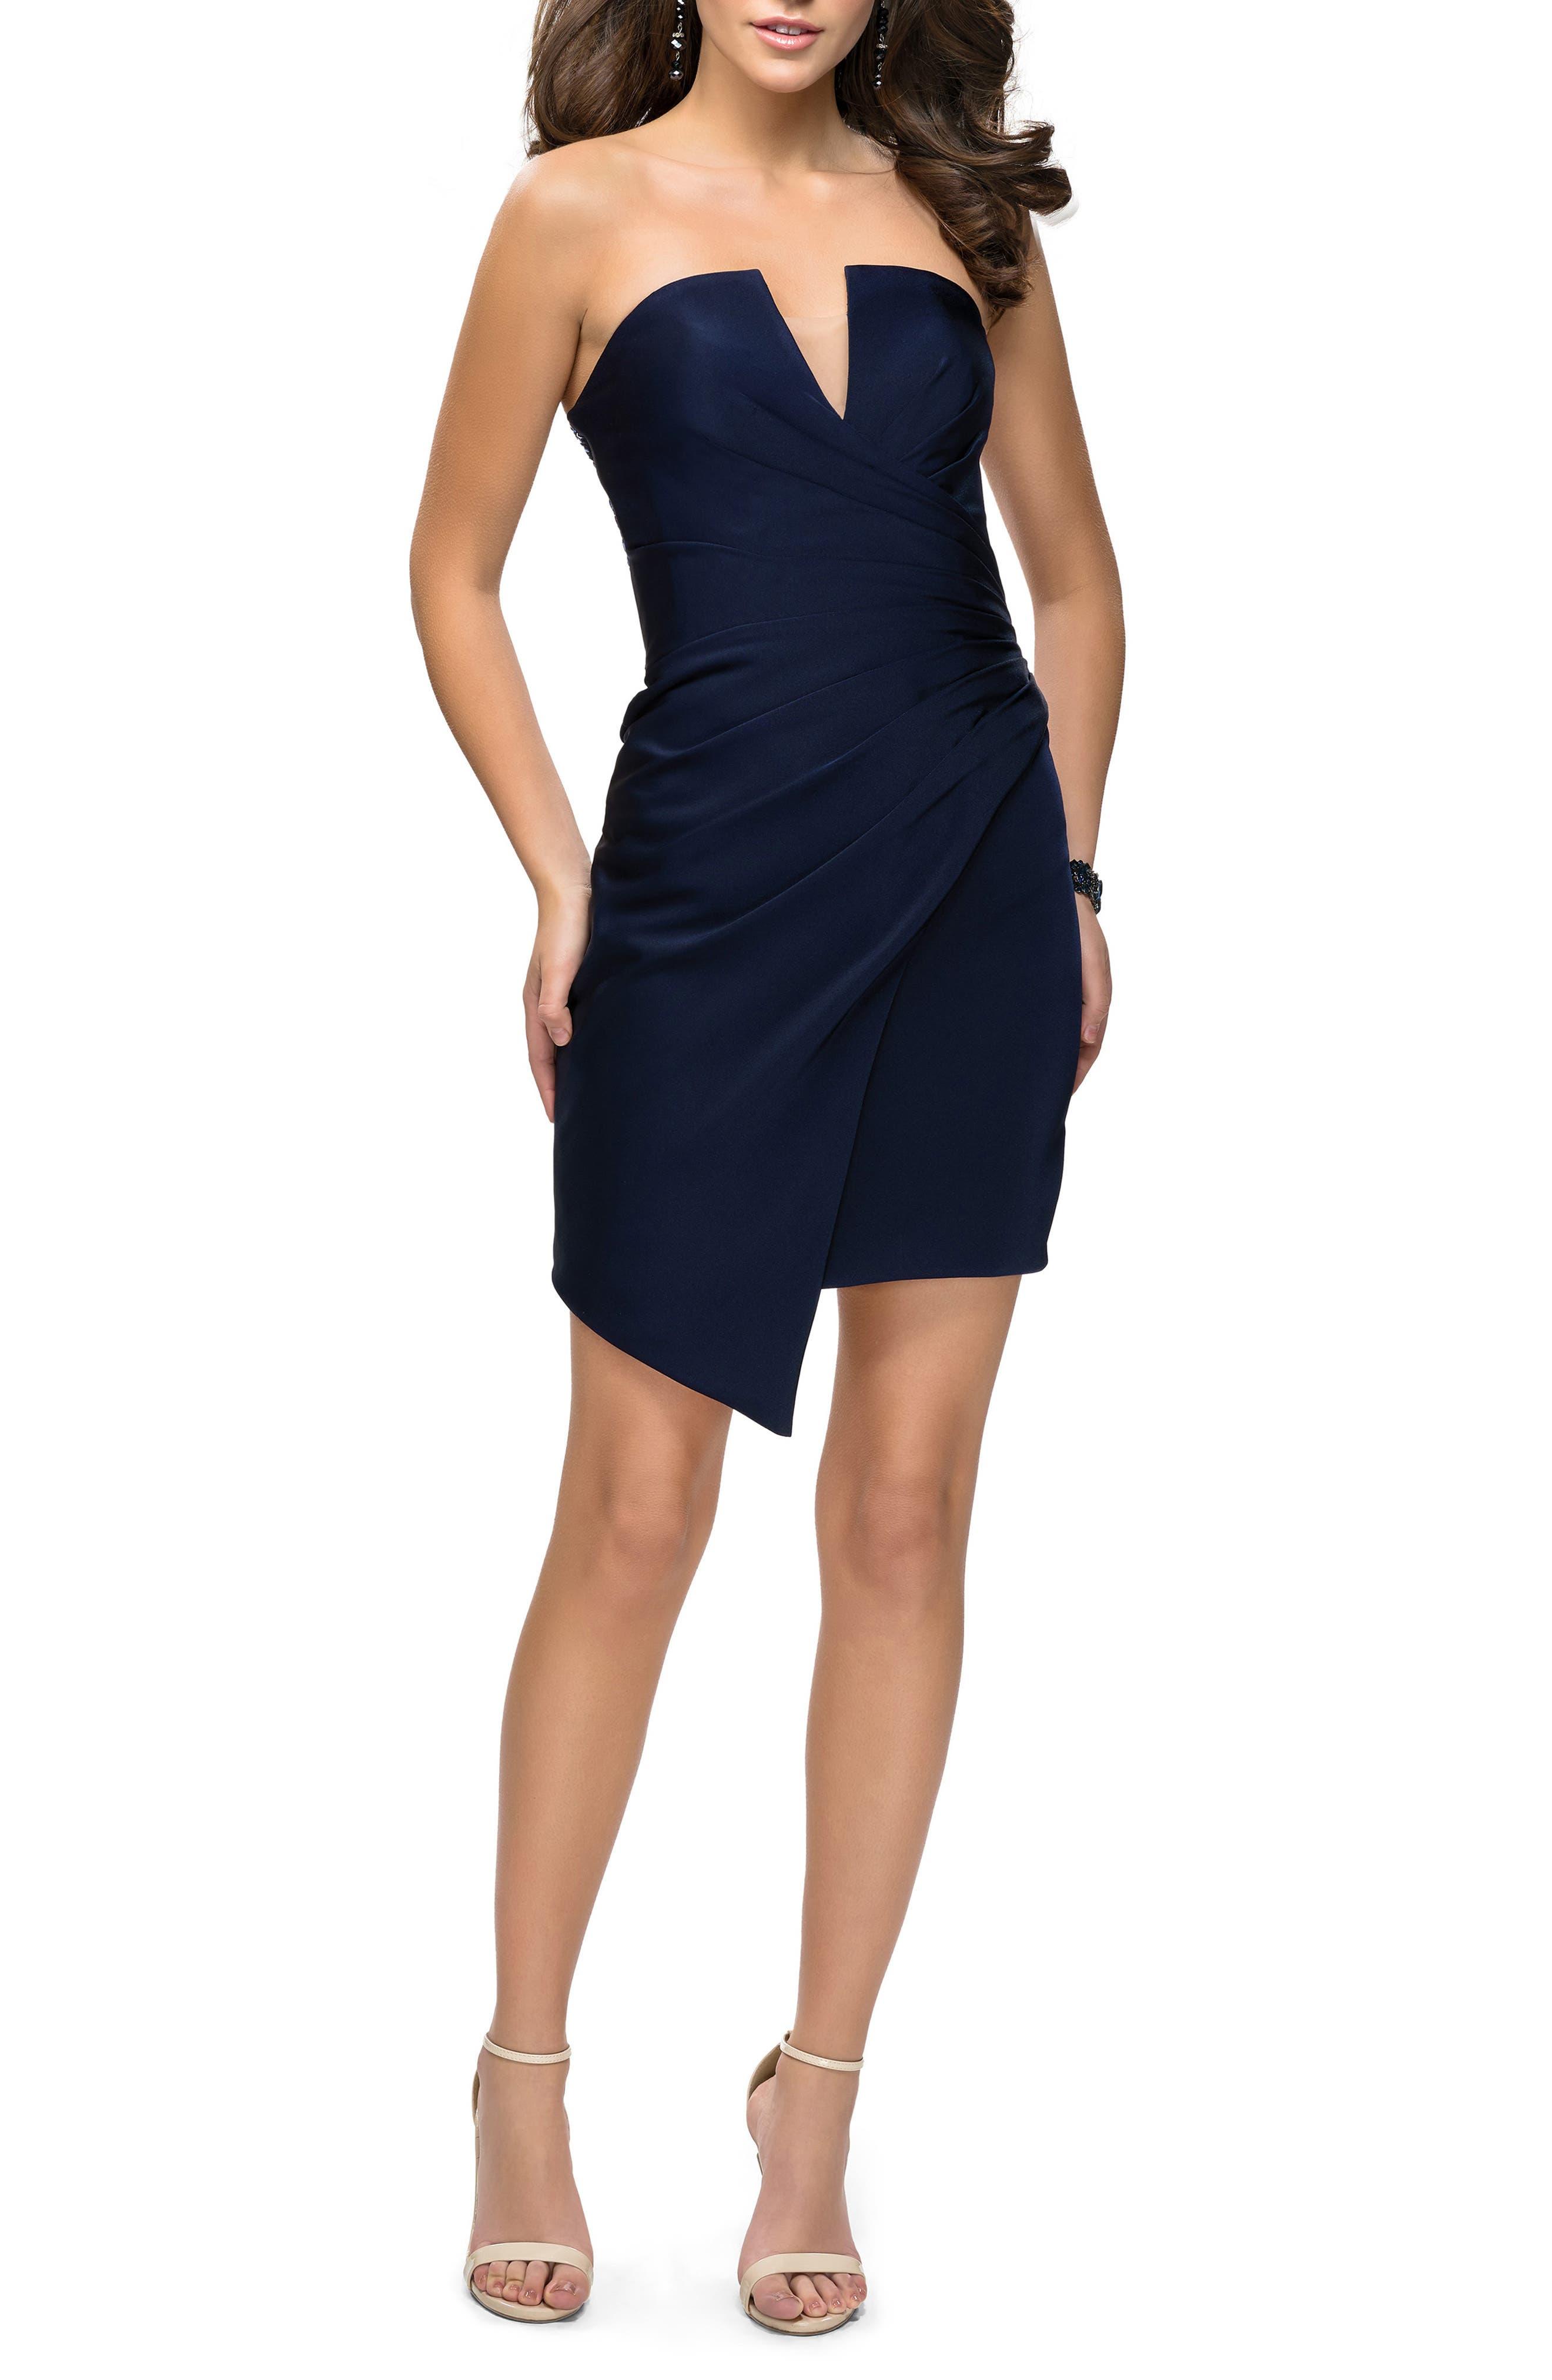 La Femme Strapless Asymmetrical Party Dress, Blue